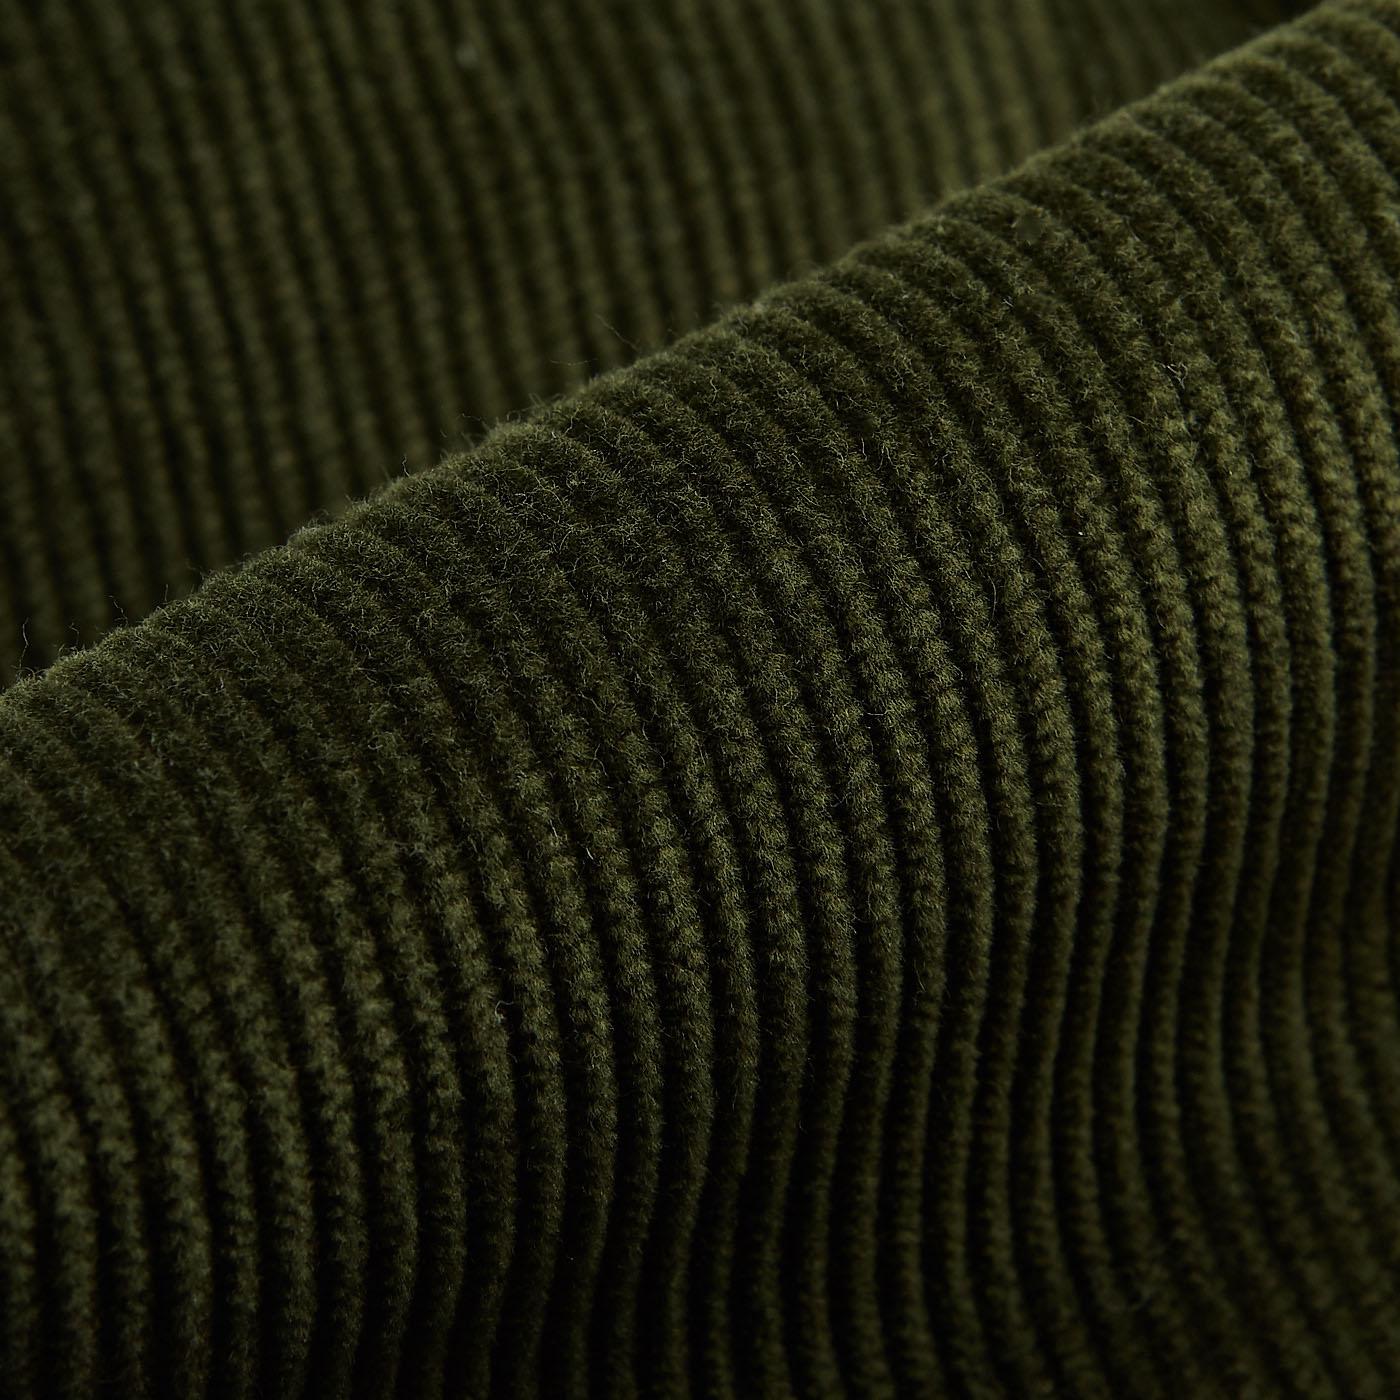 San Siro Green Cotton Corduroy Palma Trousers Fabric